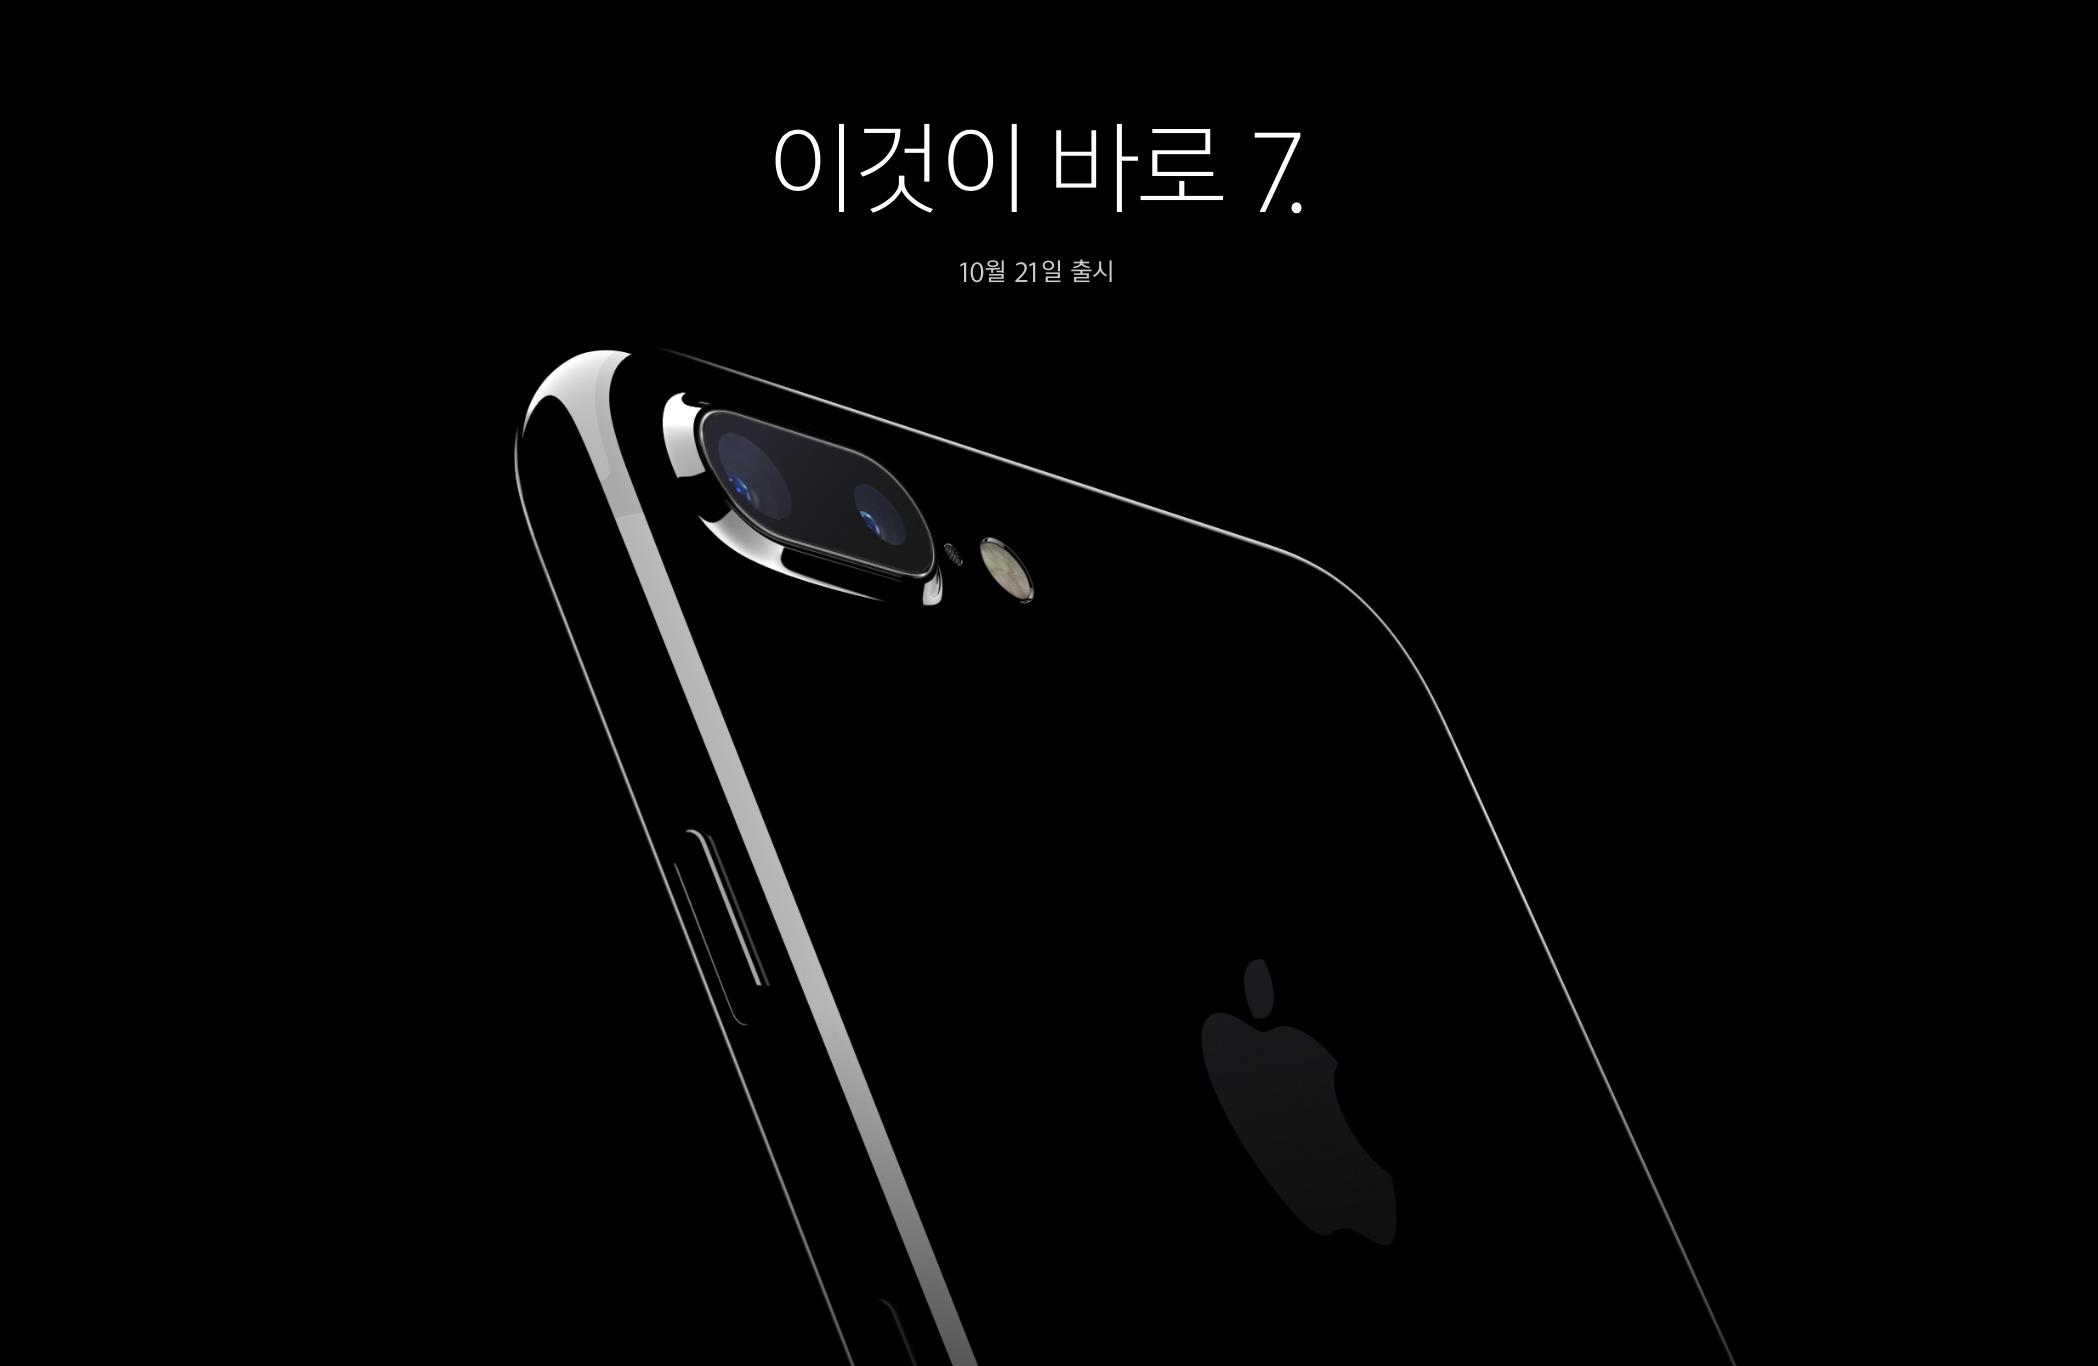 apple_kr_iphone7_20161021